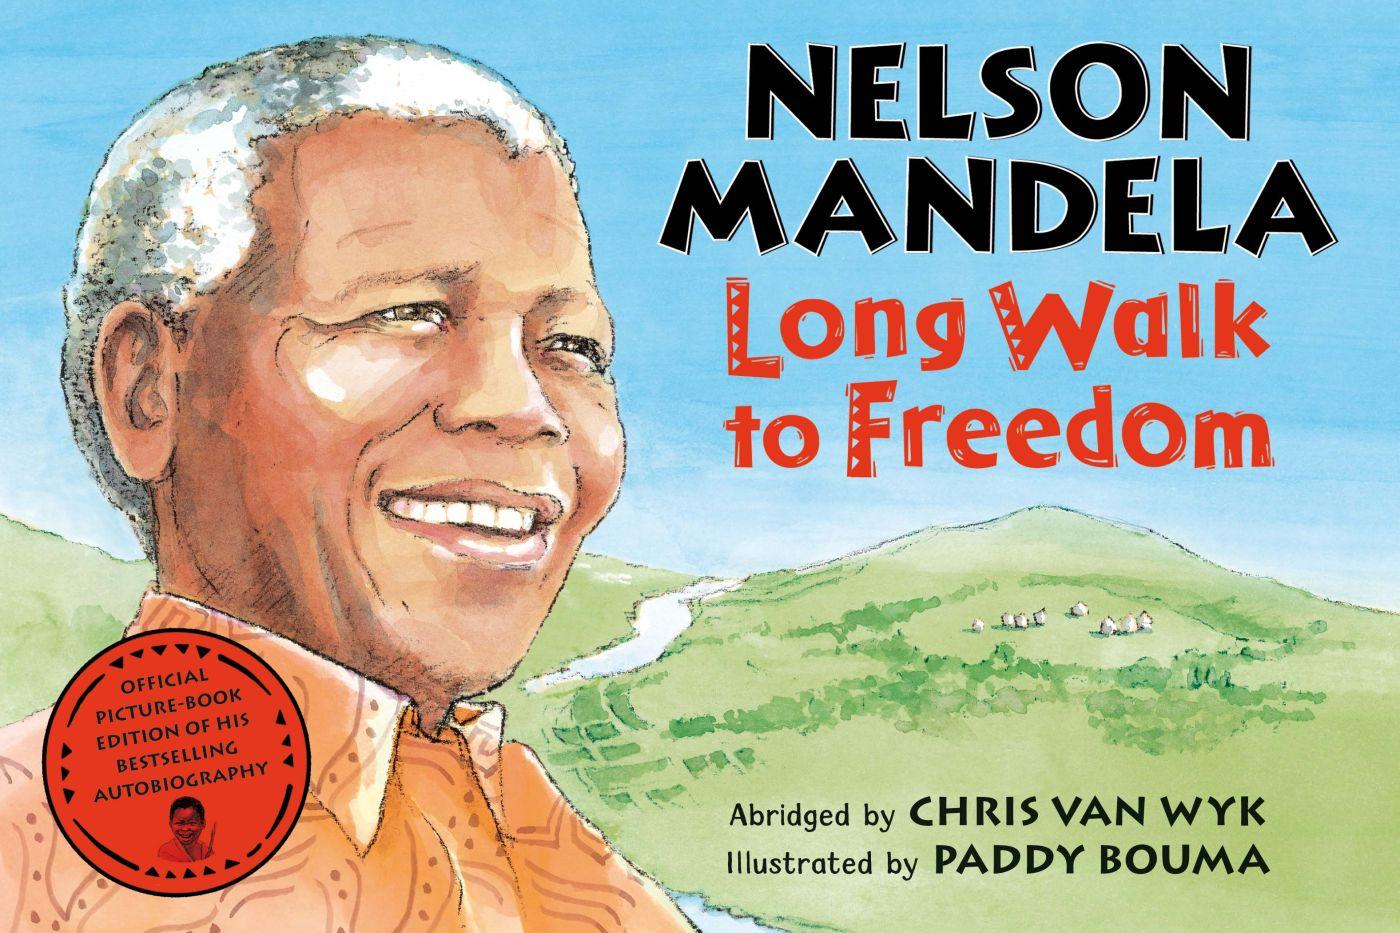 Long Walk to Freedom: children's edition – Nelson Mandela Foundation